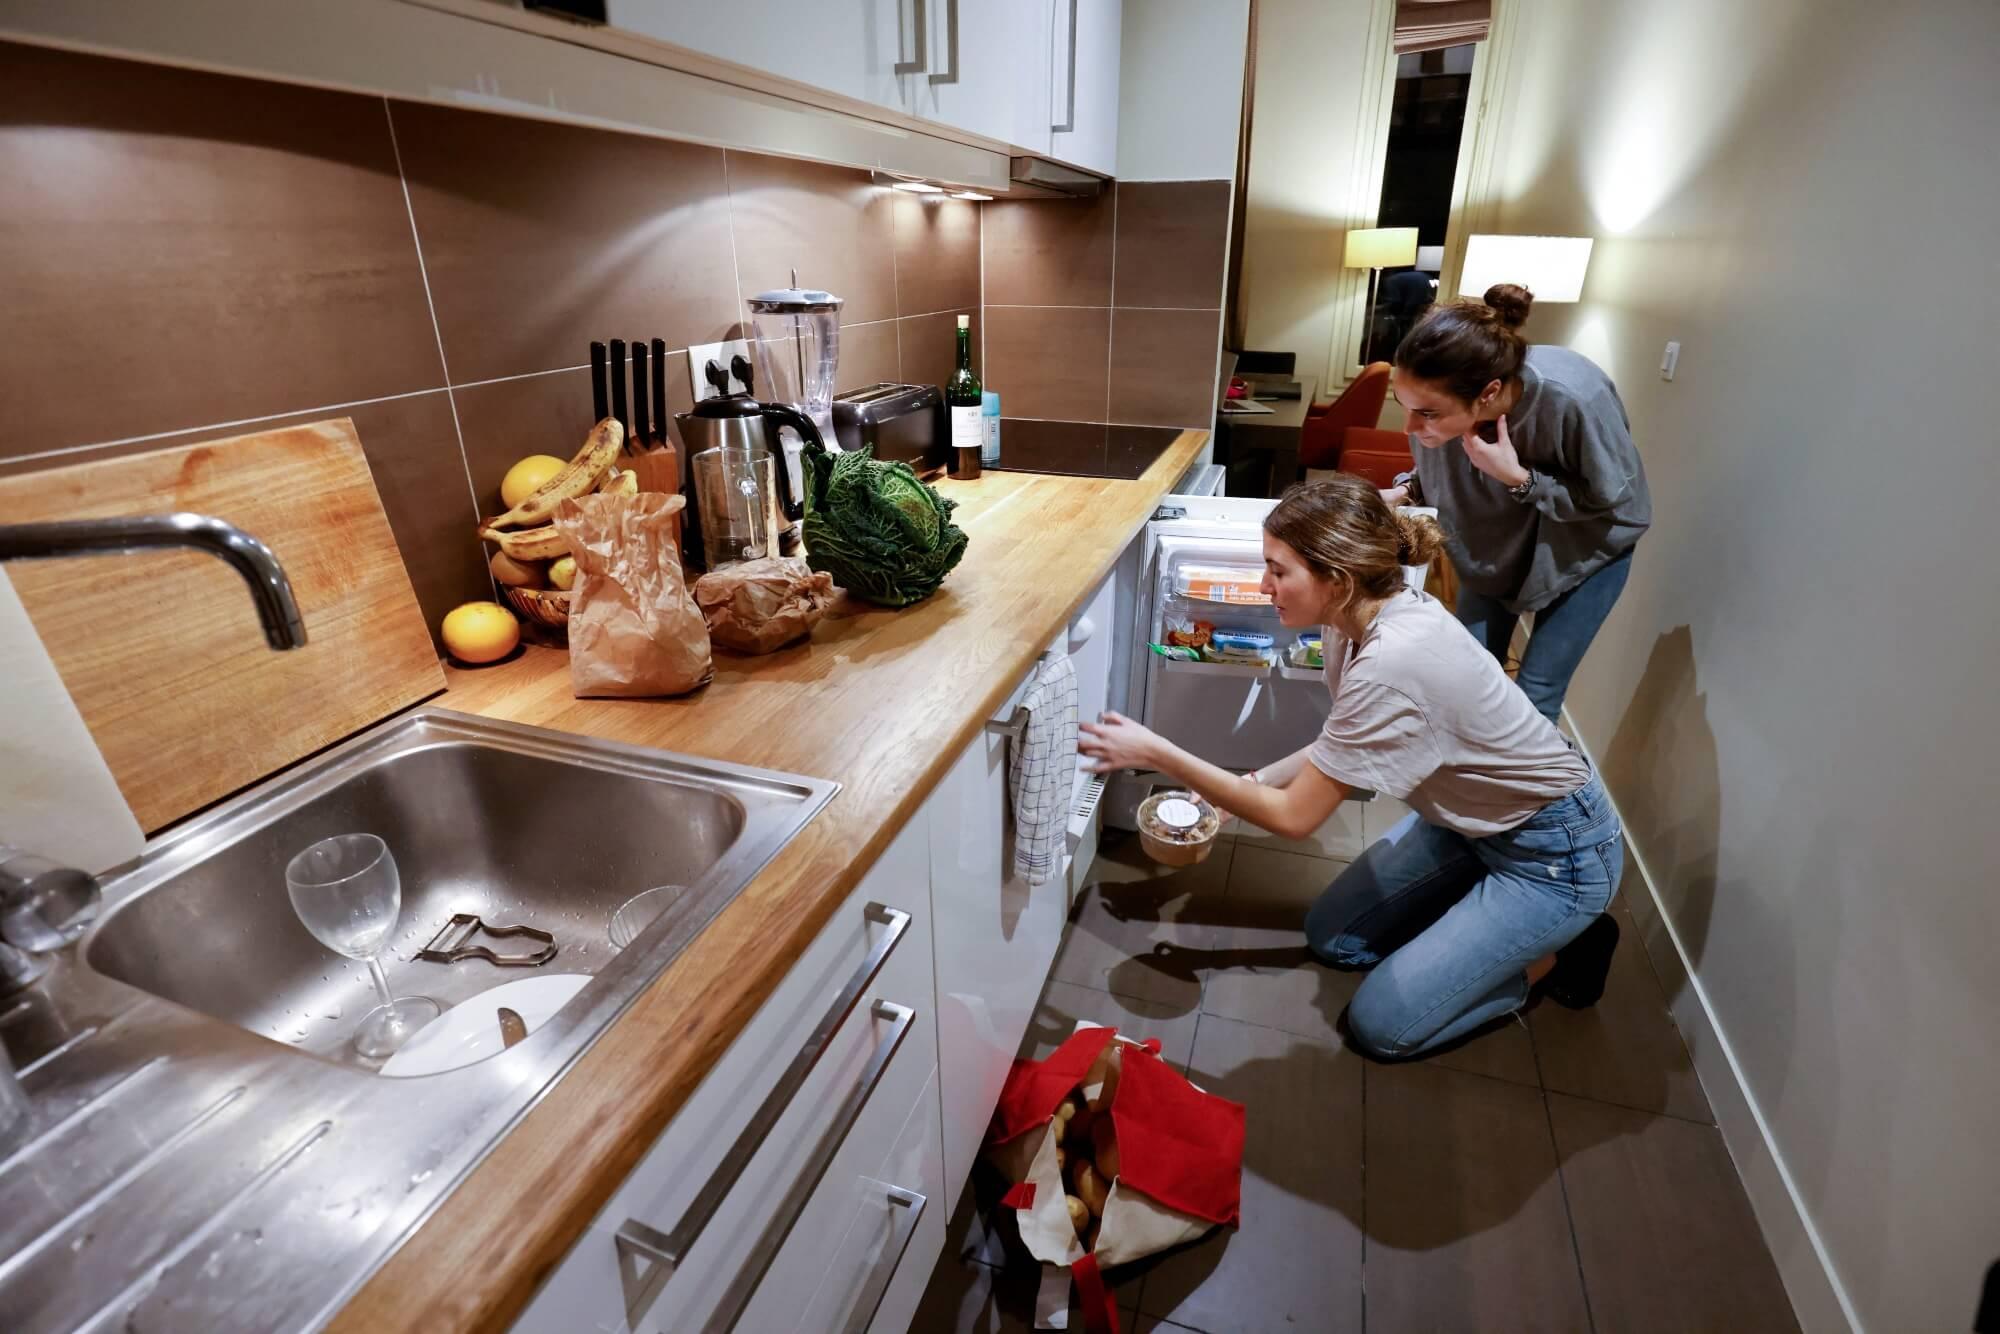 UK university students advised to find student accommodation early